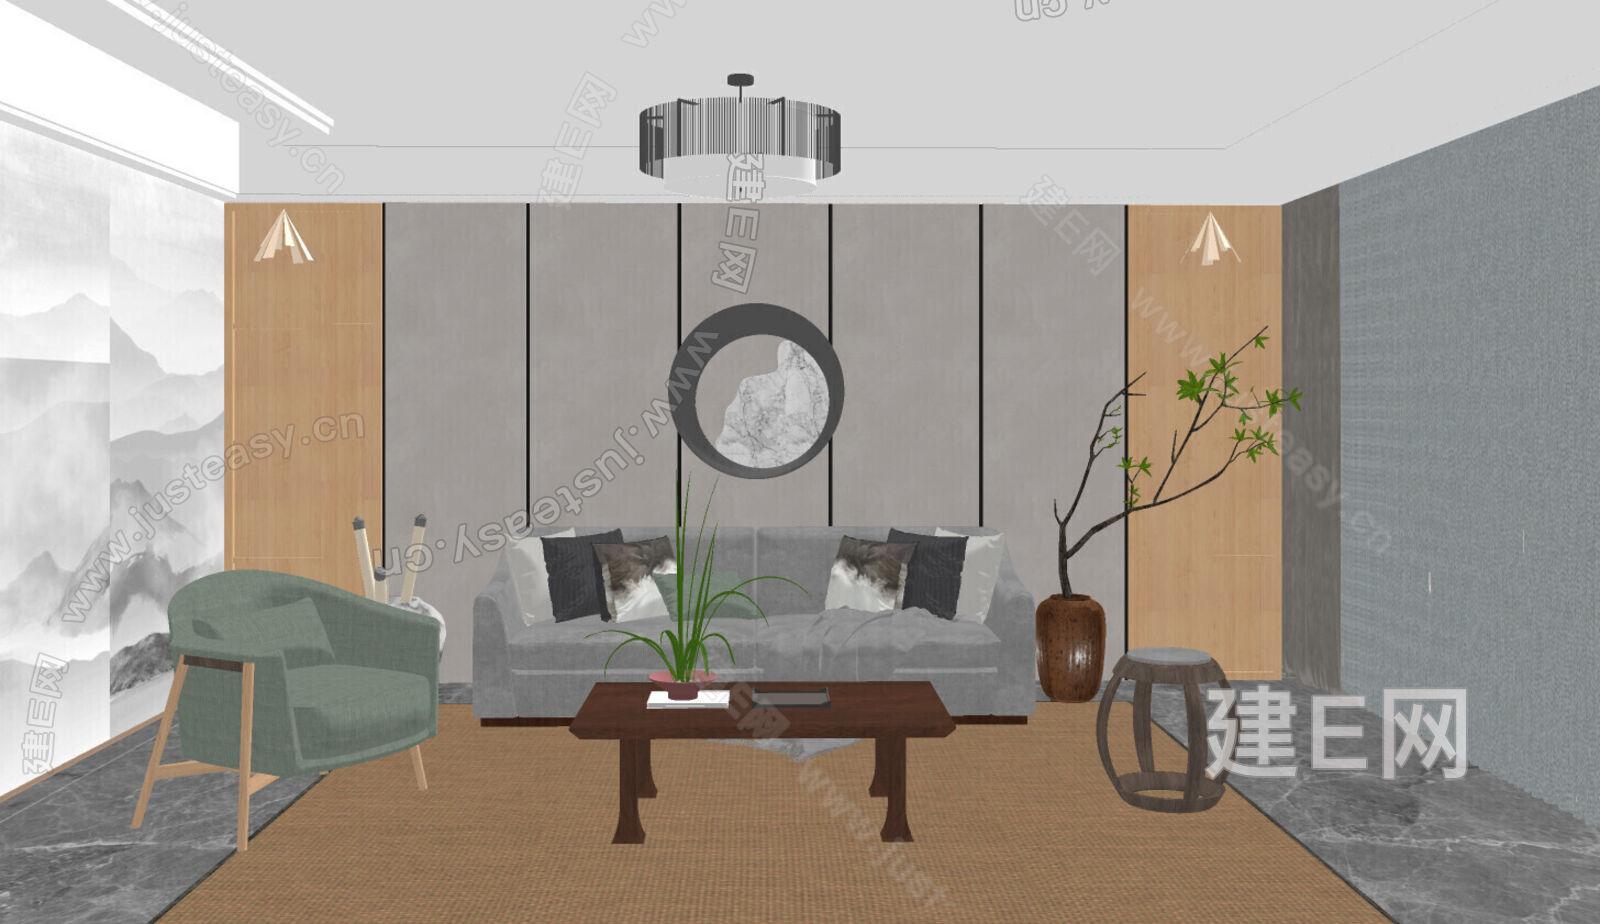 日式客厅 sketchup模型